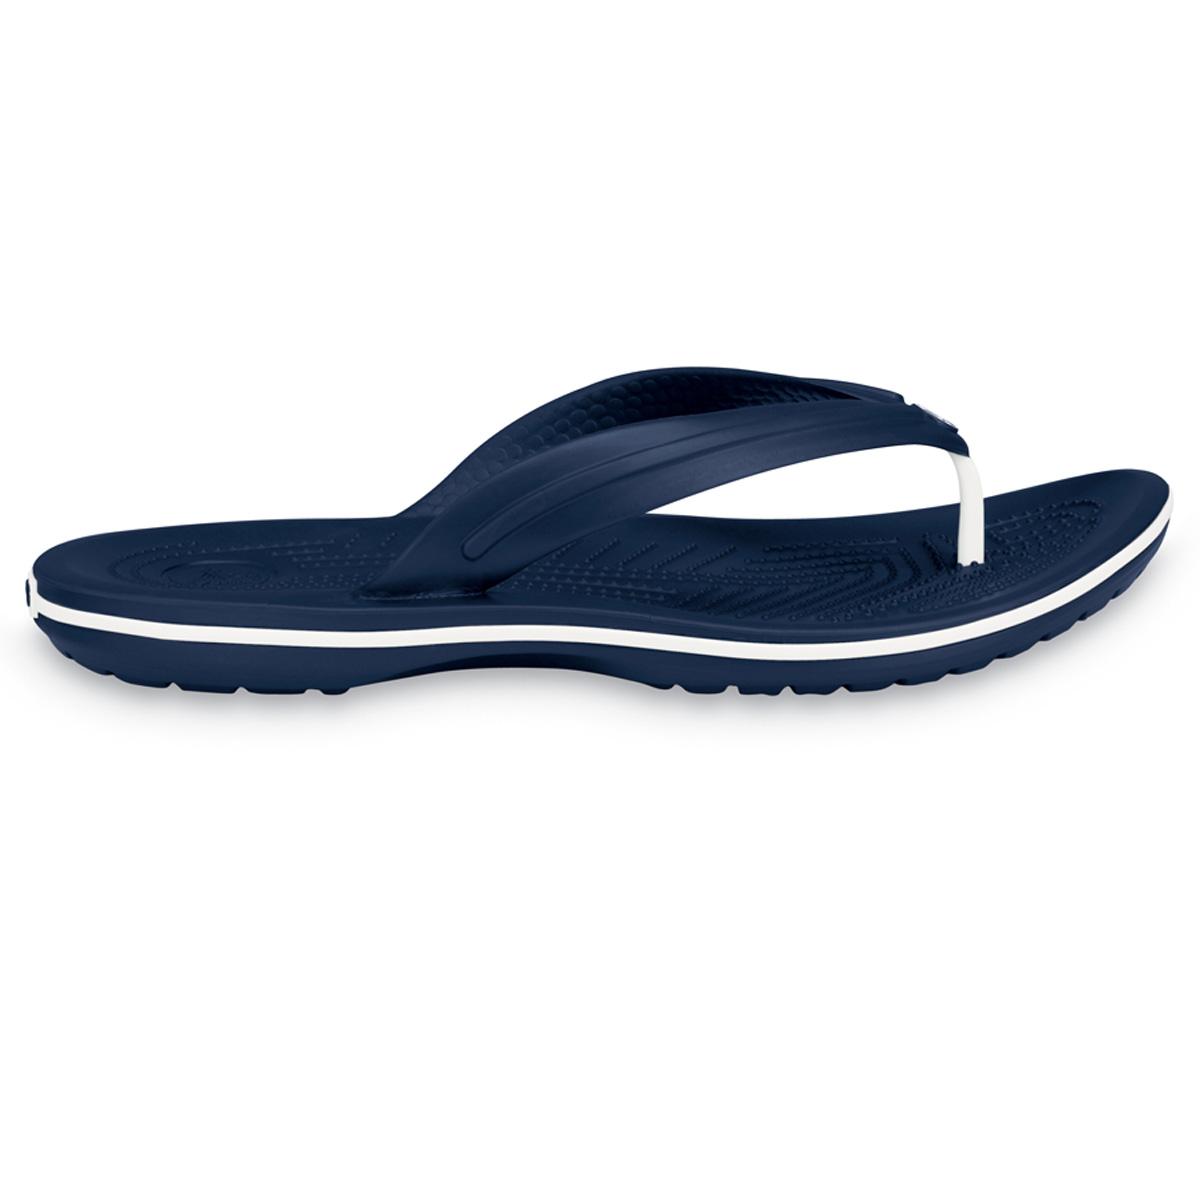 Crocs Crocband Flip - Lacivert